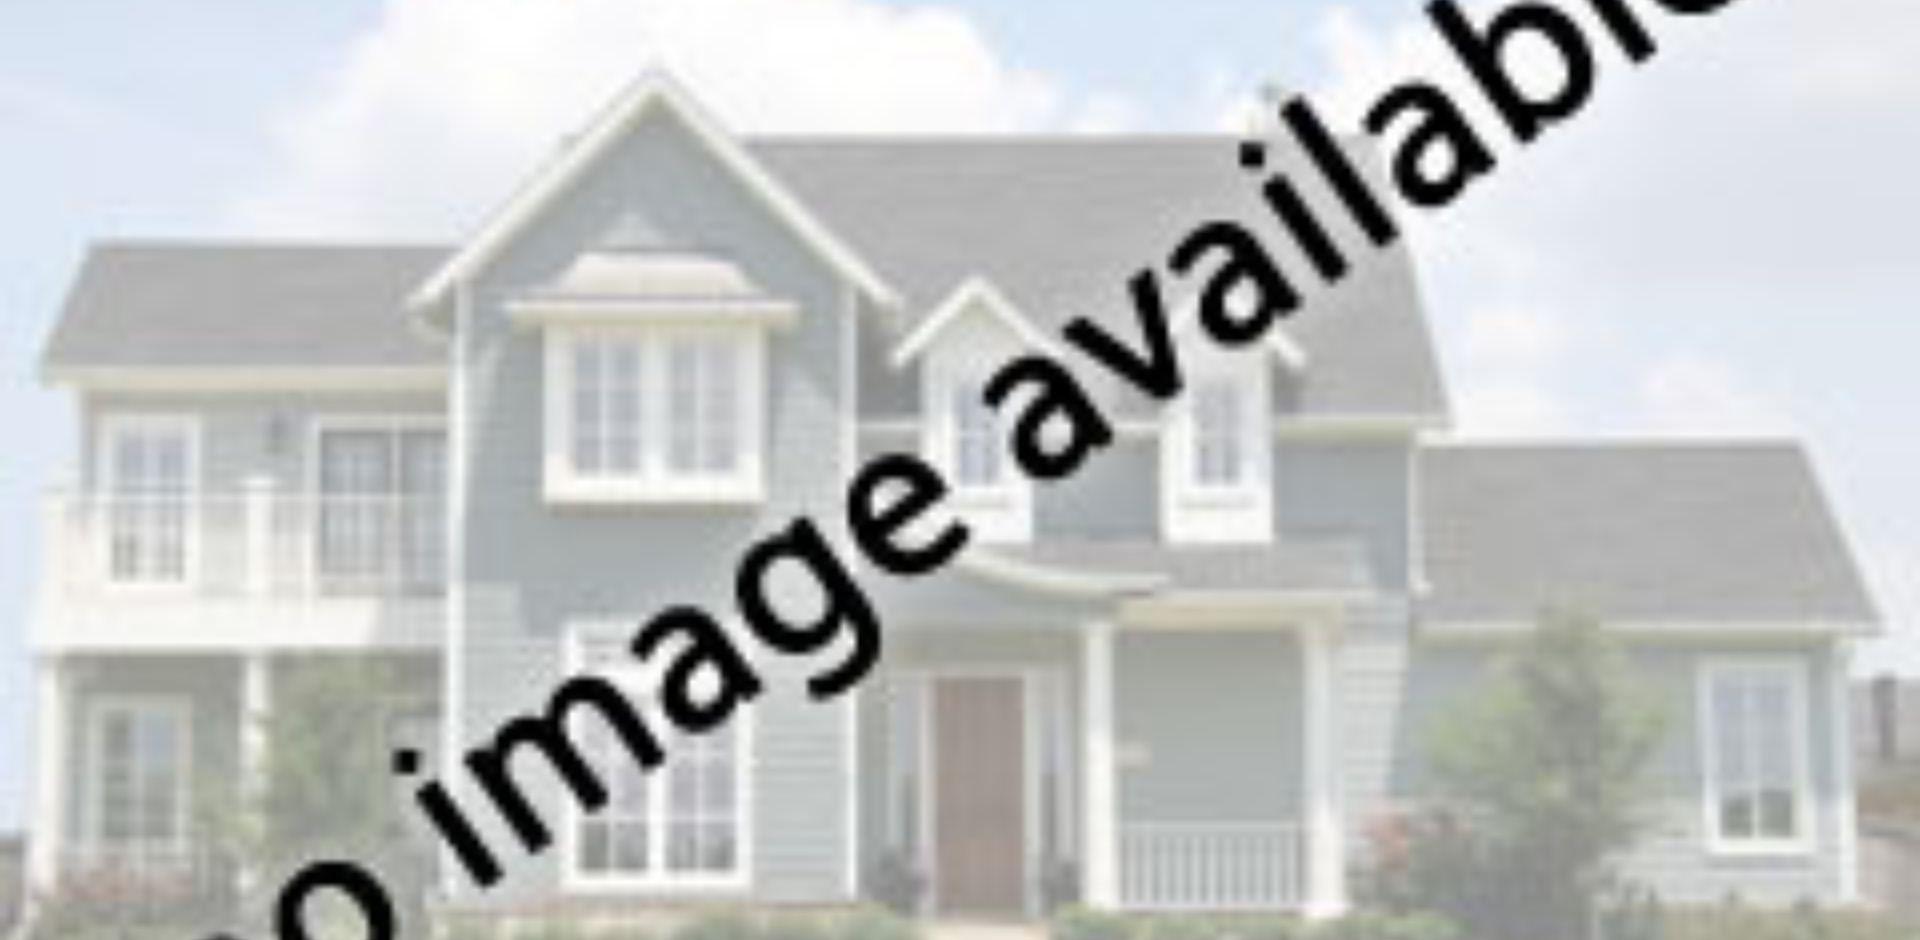 5305 Fleetwood Oaks Drive #275 Dallas, TX 75235 - Image 1